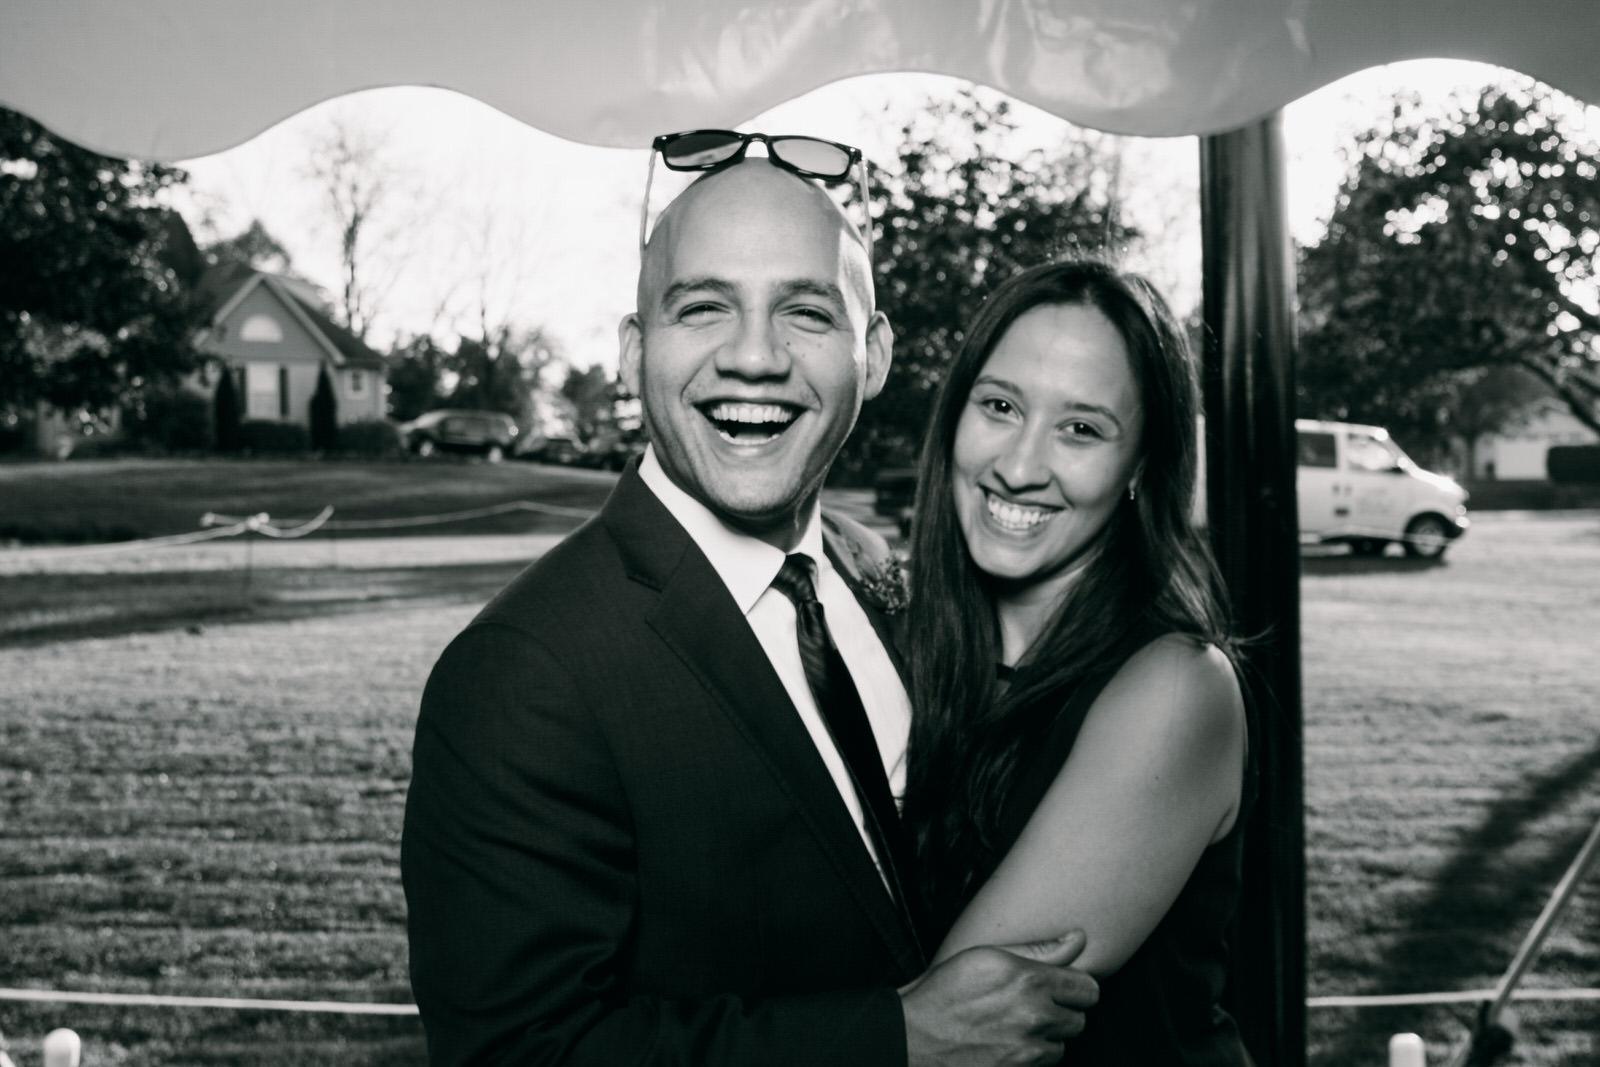 Kate-Andrew-Wedding-Photo-Booth-22.jpg